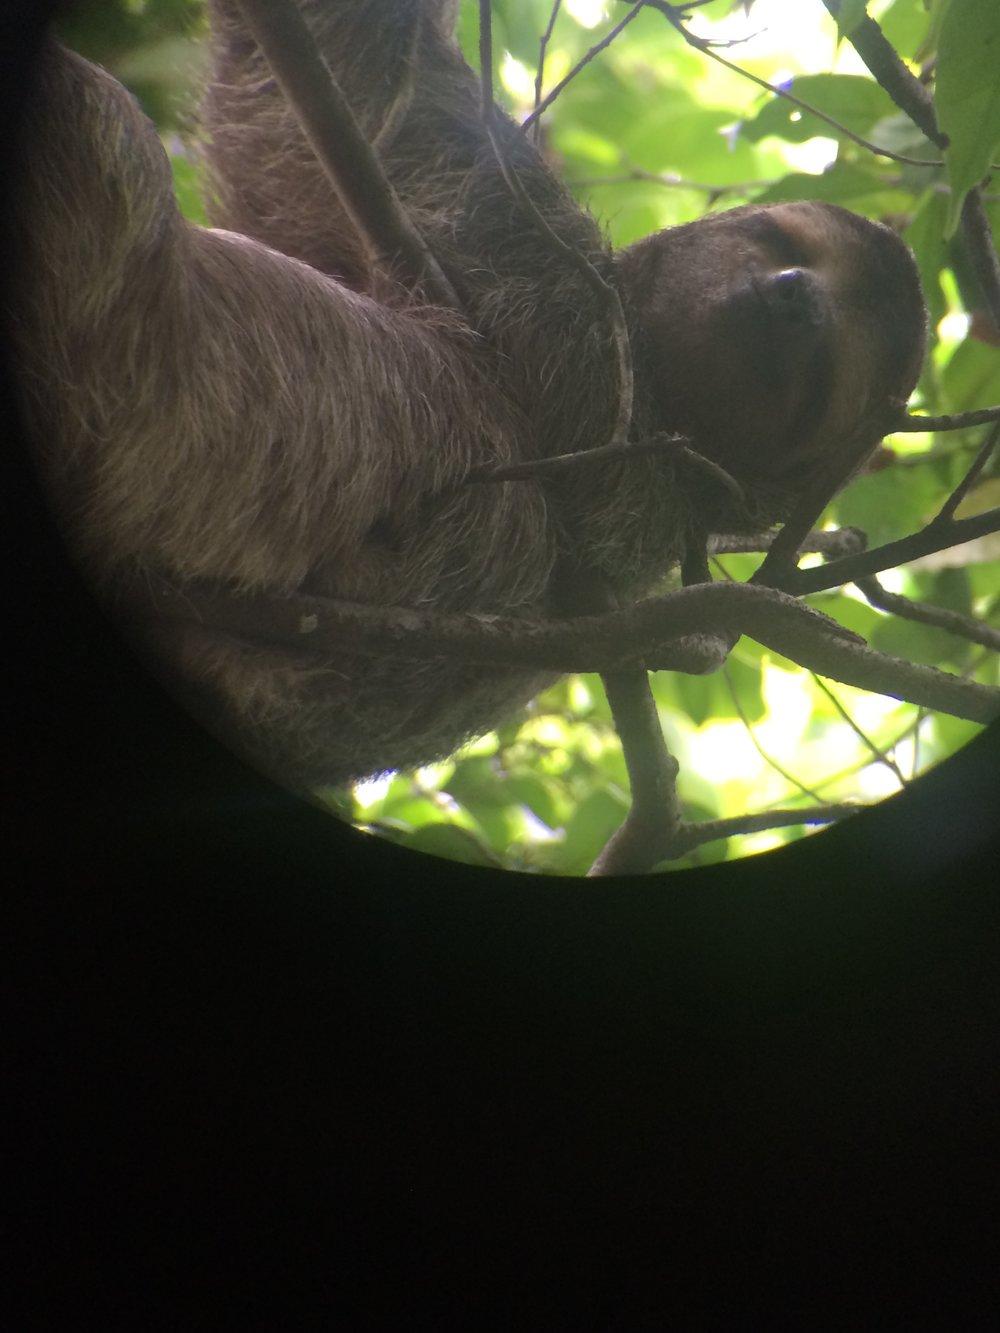 Sloth - Who answers